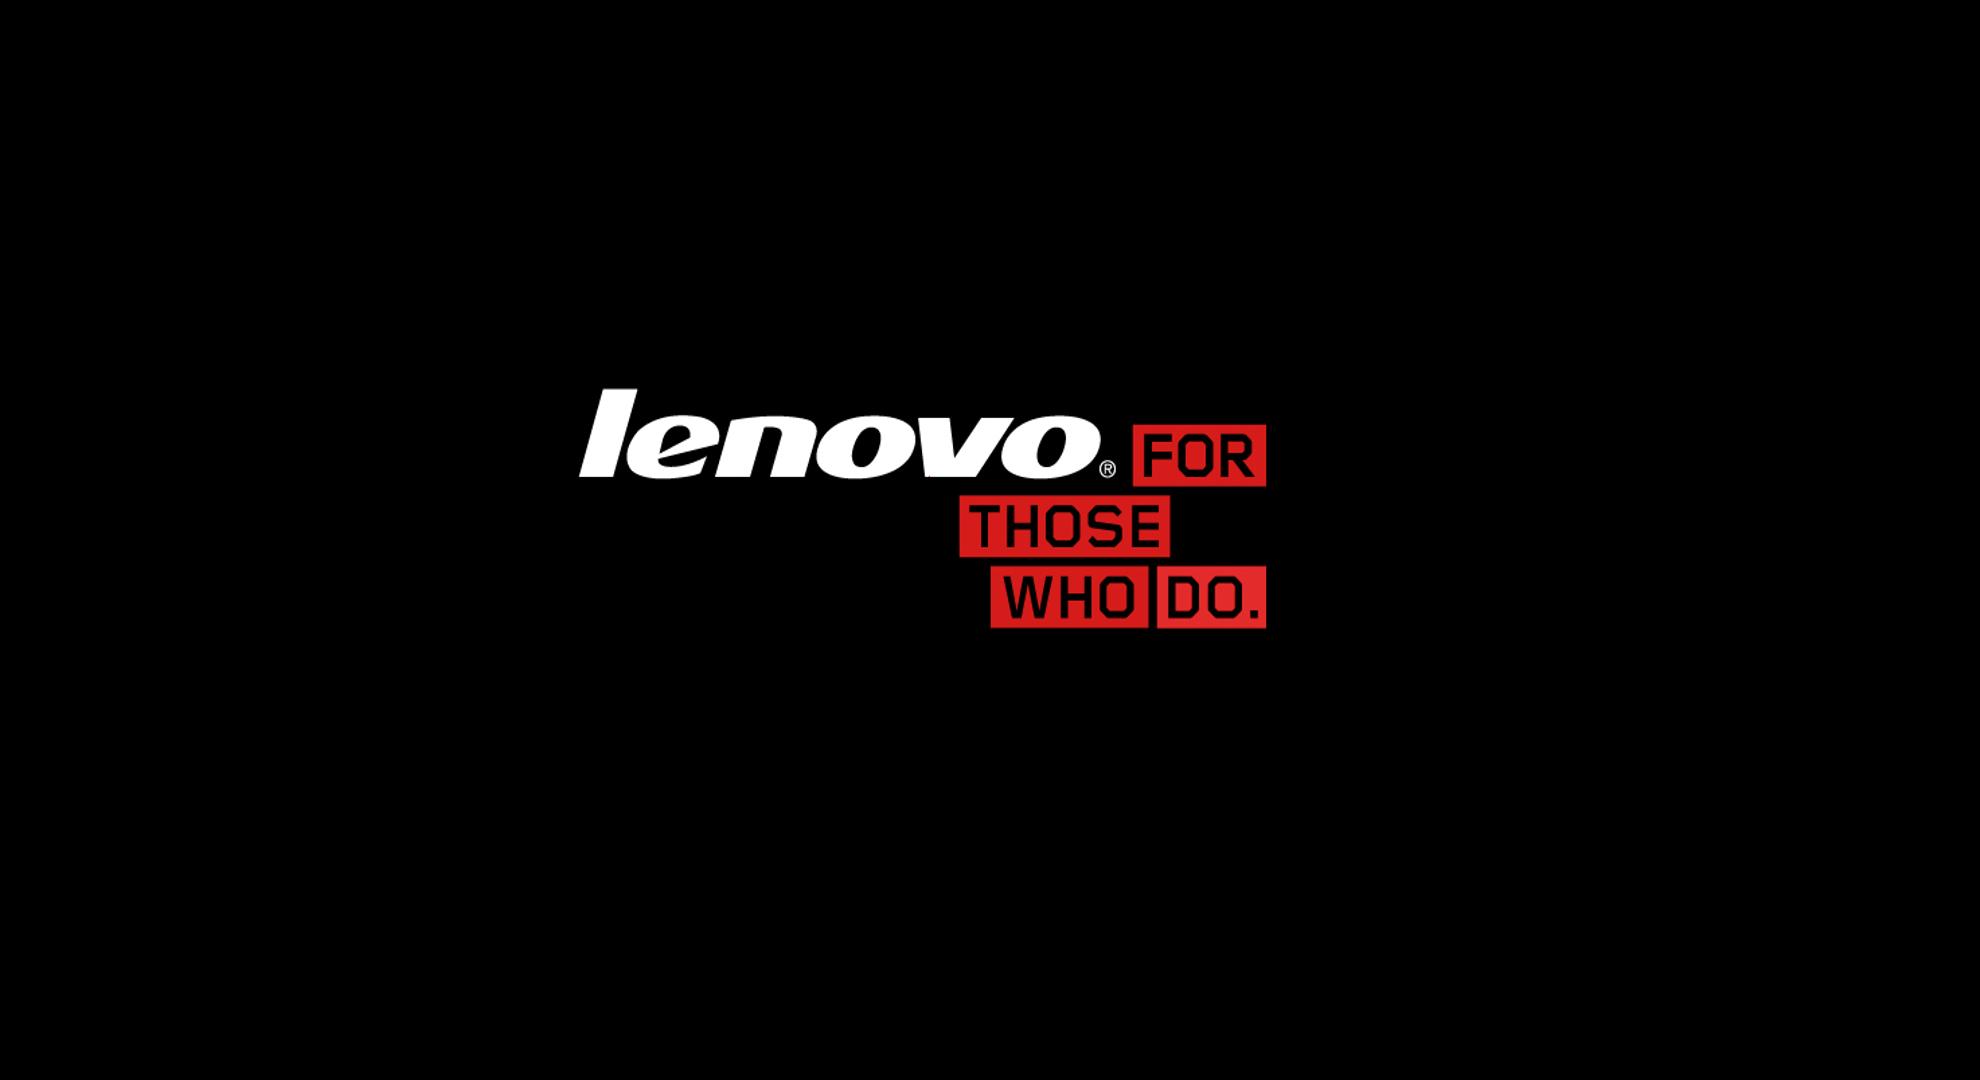 Lenovo Logo Full HD Wallpaper And Background Image